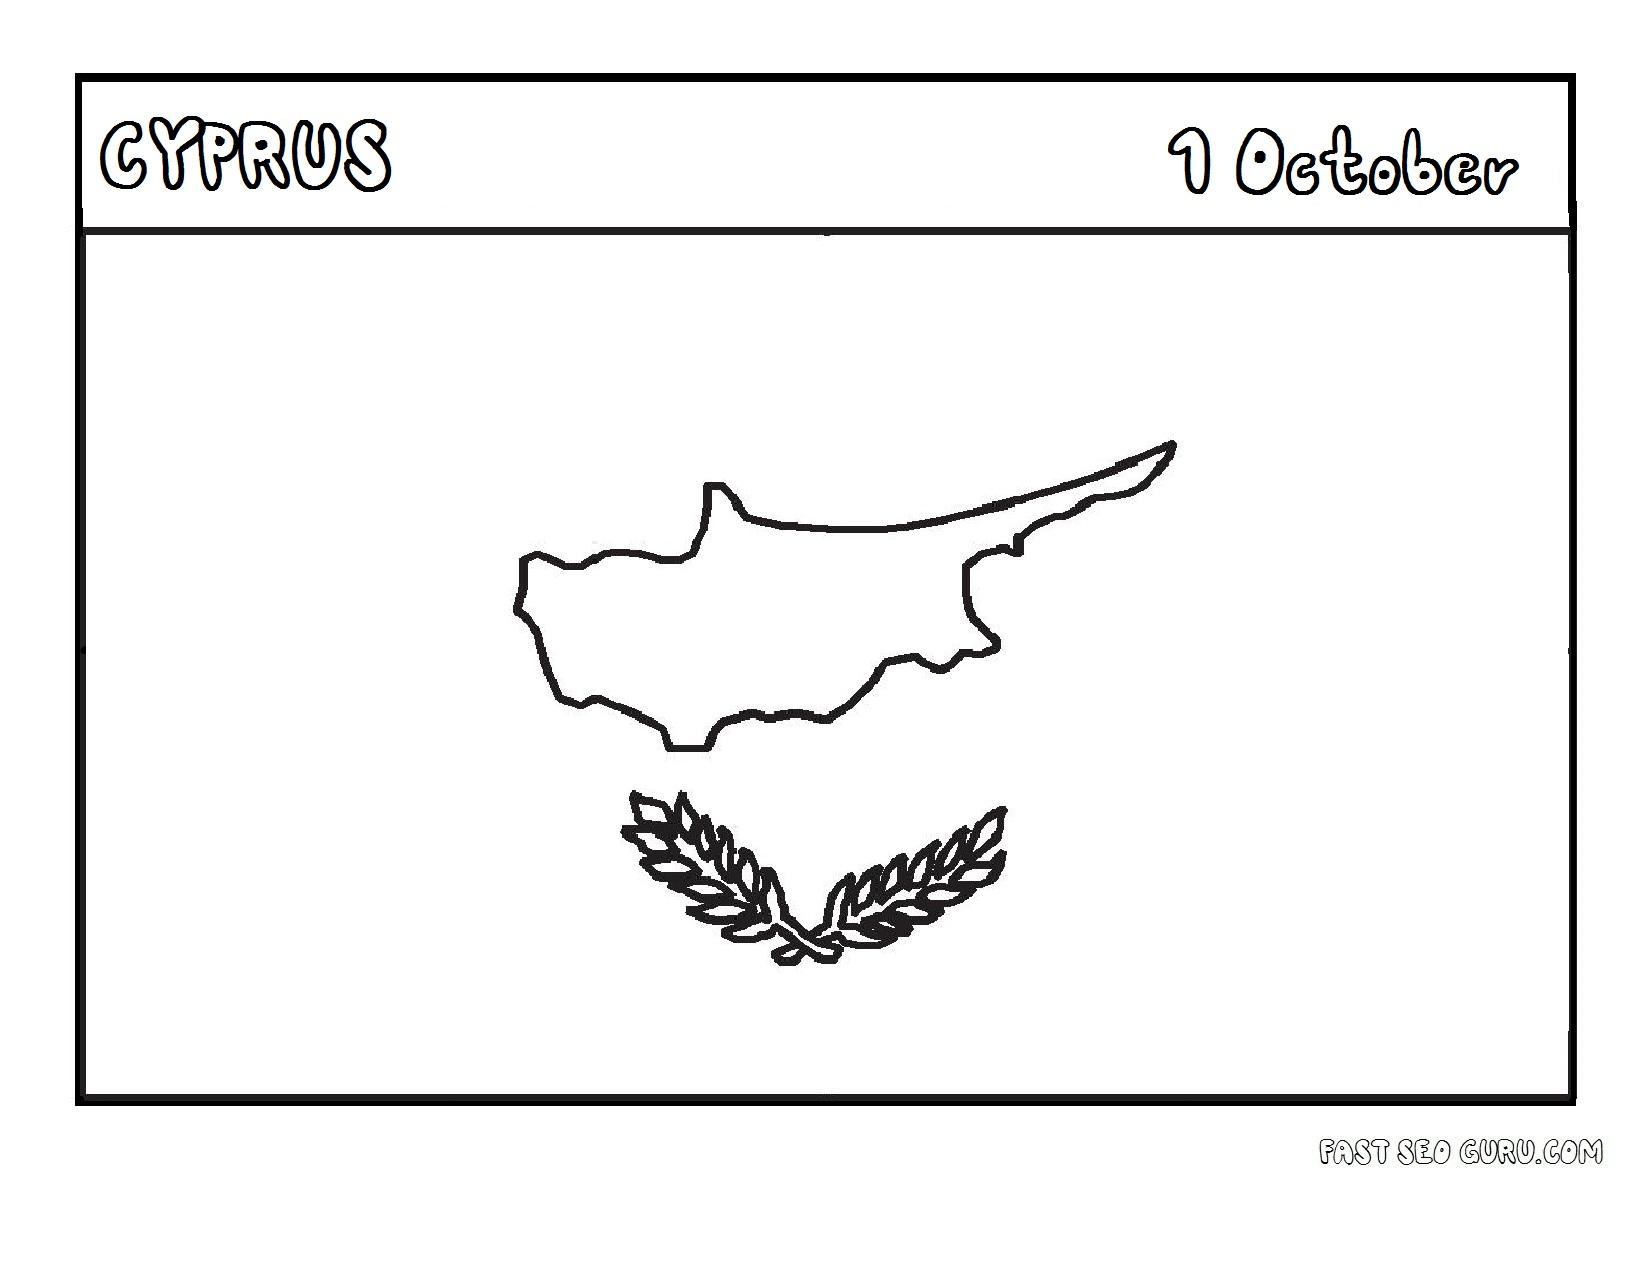 World Map Wallpaper Black And White Printable Flag Of Cyprus Coloring Page Printable